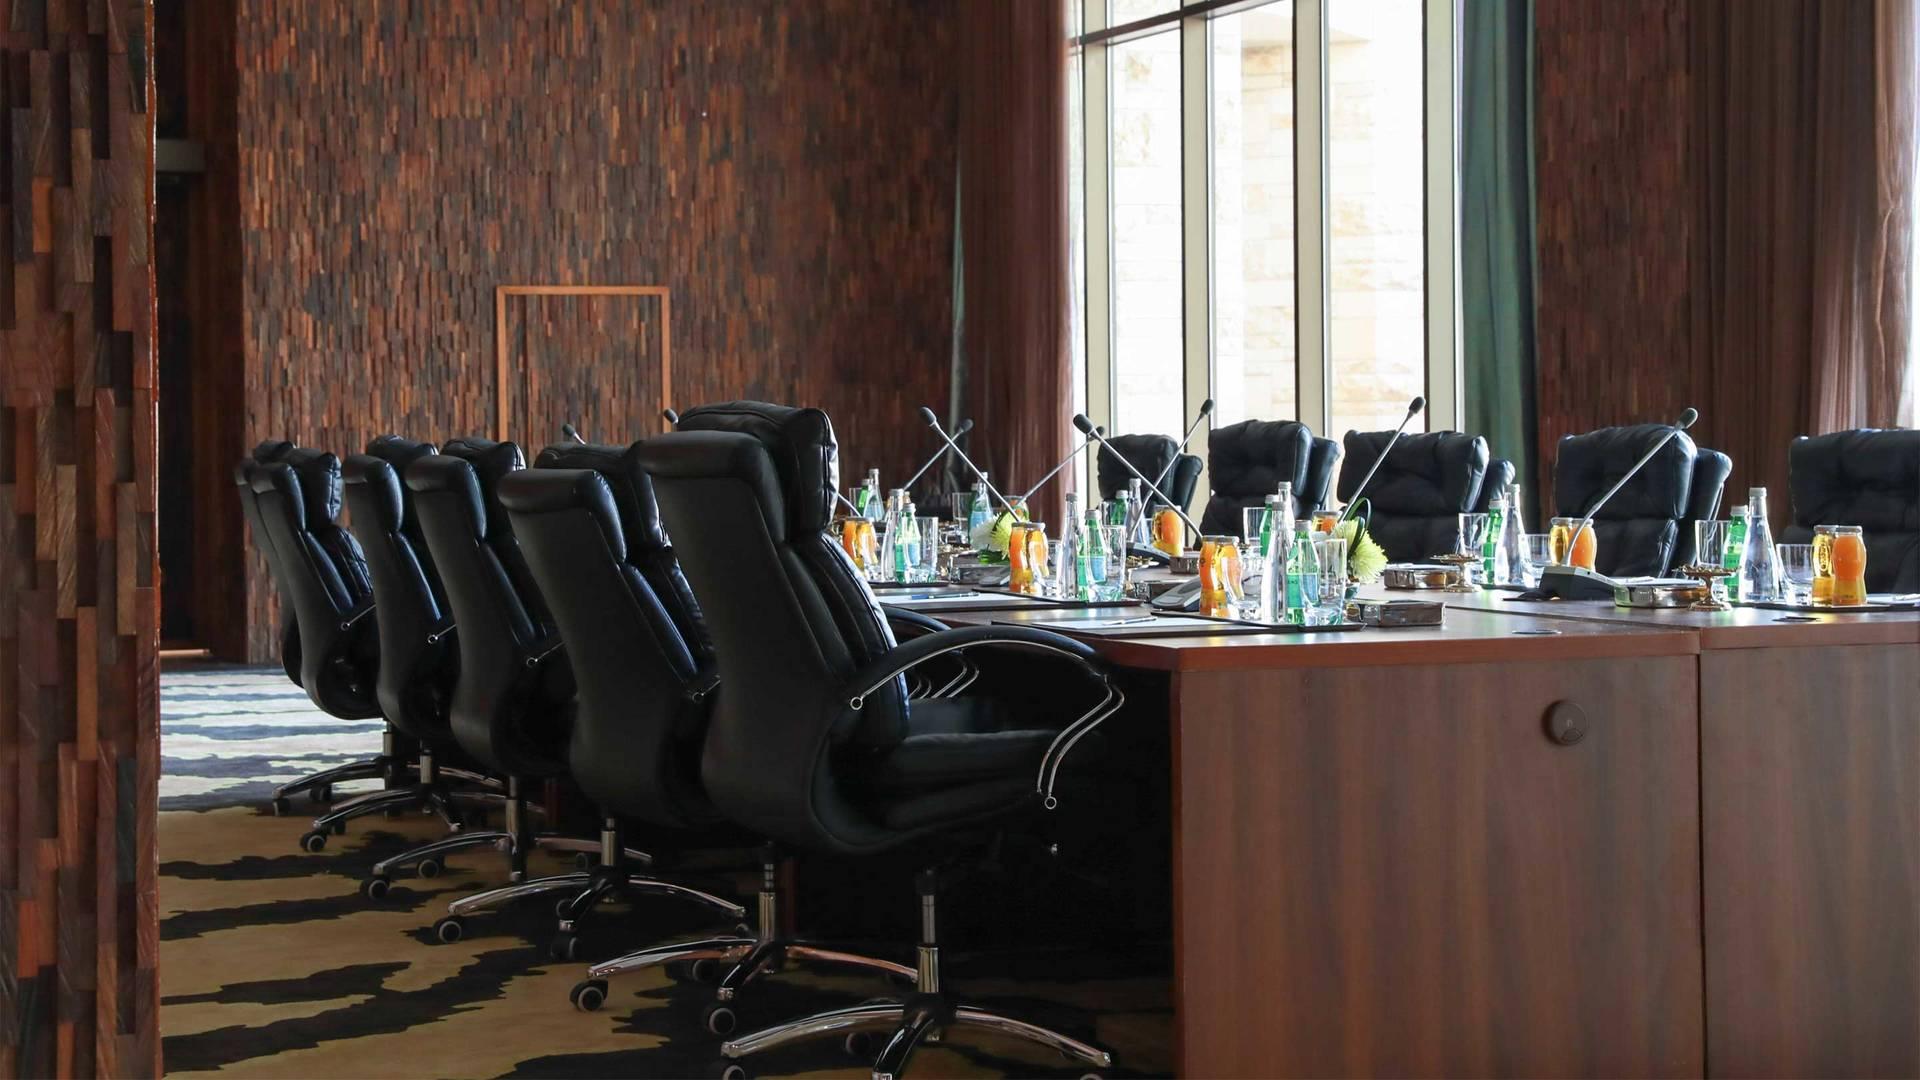 https://cdn.jumeirah.com/-/mediadh/DH/Hospitality/Jumeirah/Hotels/Kuwait/Jumeirah-Messilah-Beach-Hotel-and-Spa/Meeting-Rooms/Al-Sadu/16-9-Al-Sadu-left-close-Meeting-RoomJumeirahMessilahBeachHotelSpa5_landscape.jpg?h=1080&w=1920&hash=7E2B5F67EC2520CEB5B372D6C2DEBAED